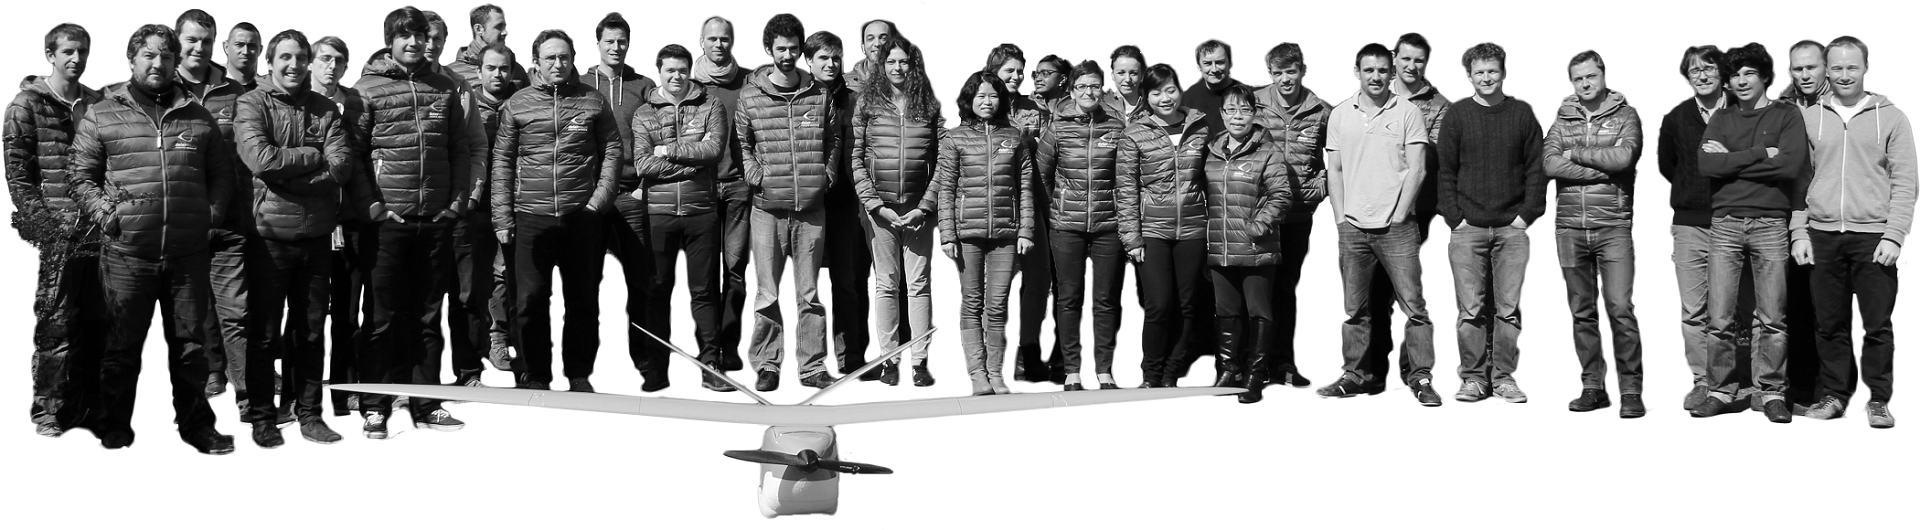 Delair-Tech long range UAV employees